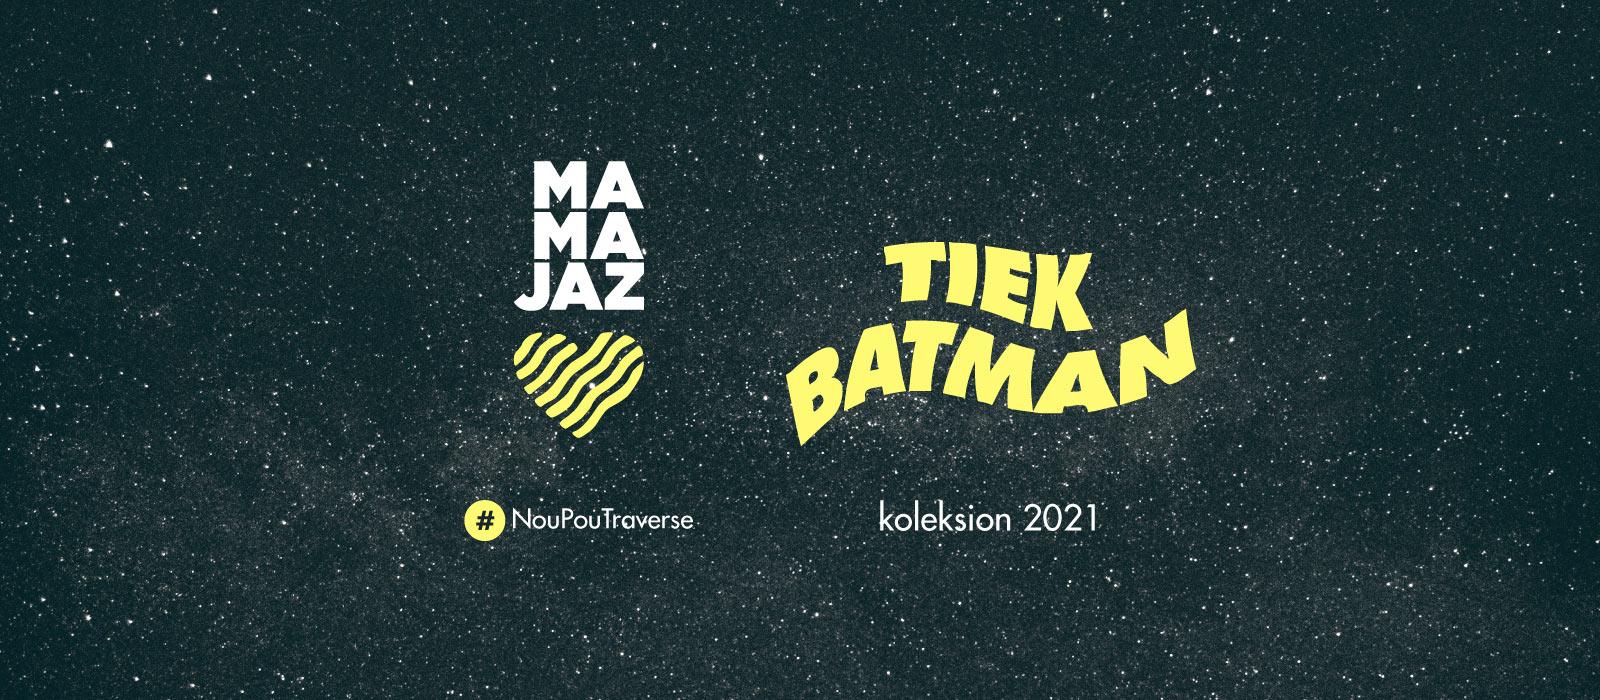 Mama jaz collection 2021